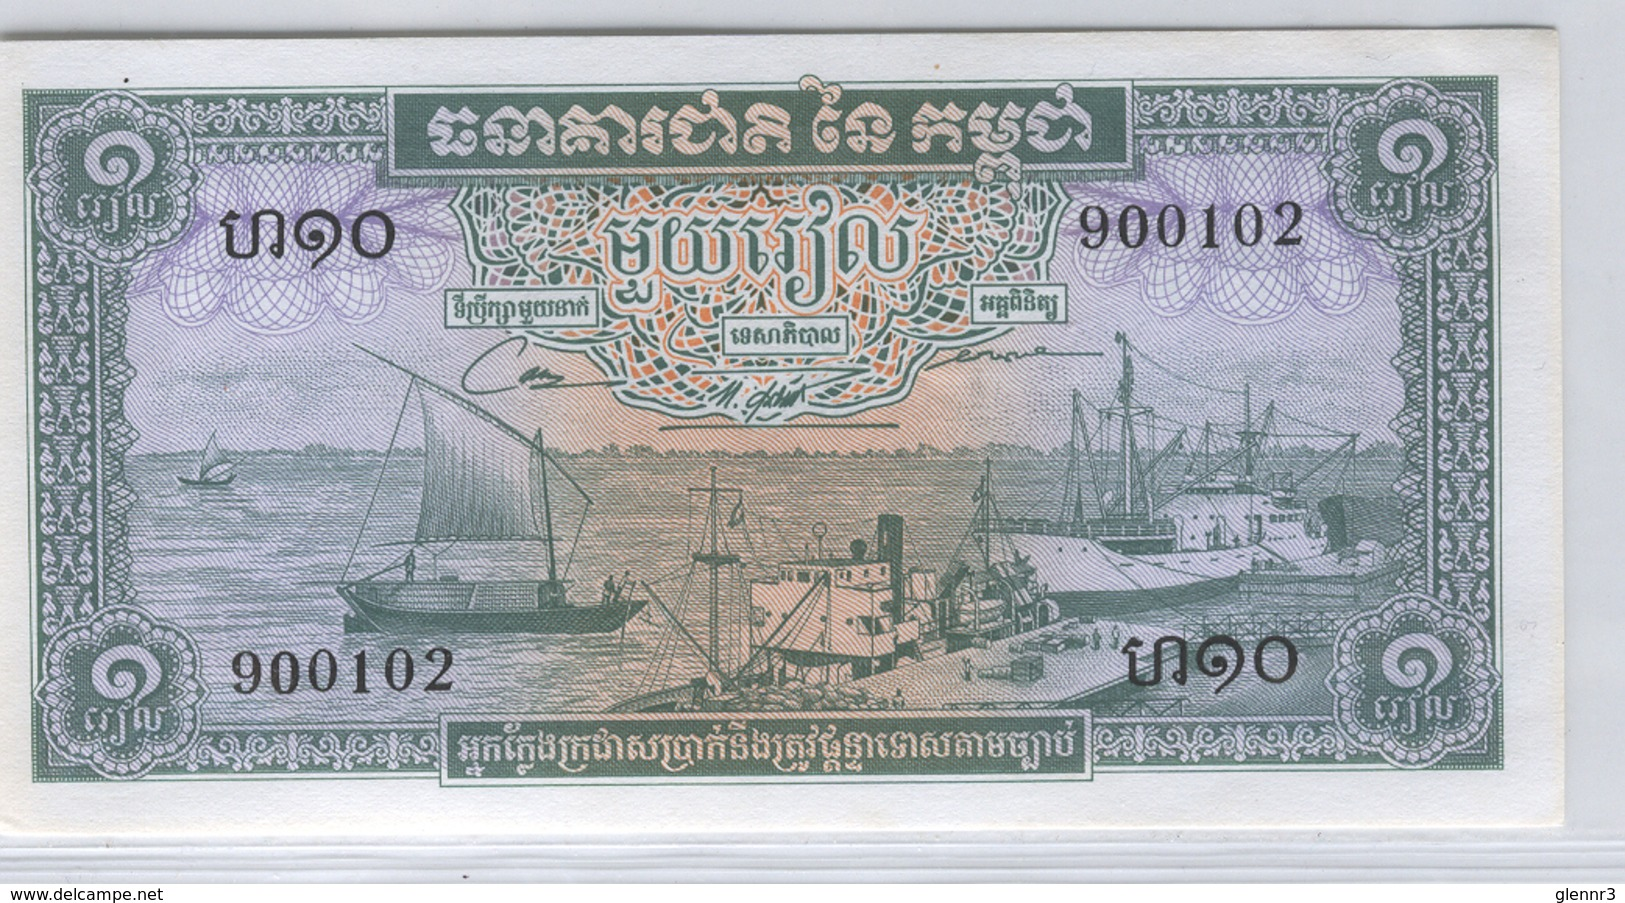 CAMBODIA 4c 1972 1 Riel UNC - Cambodia